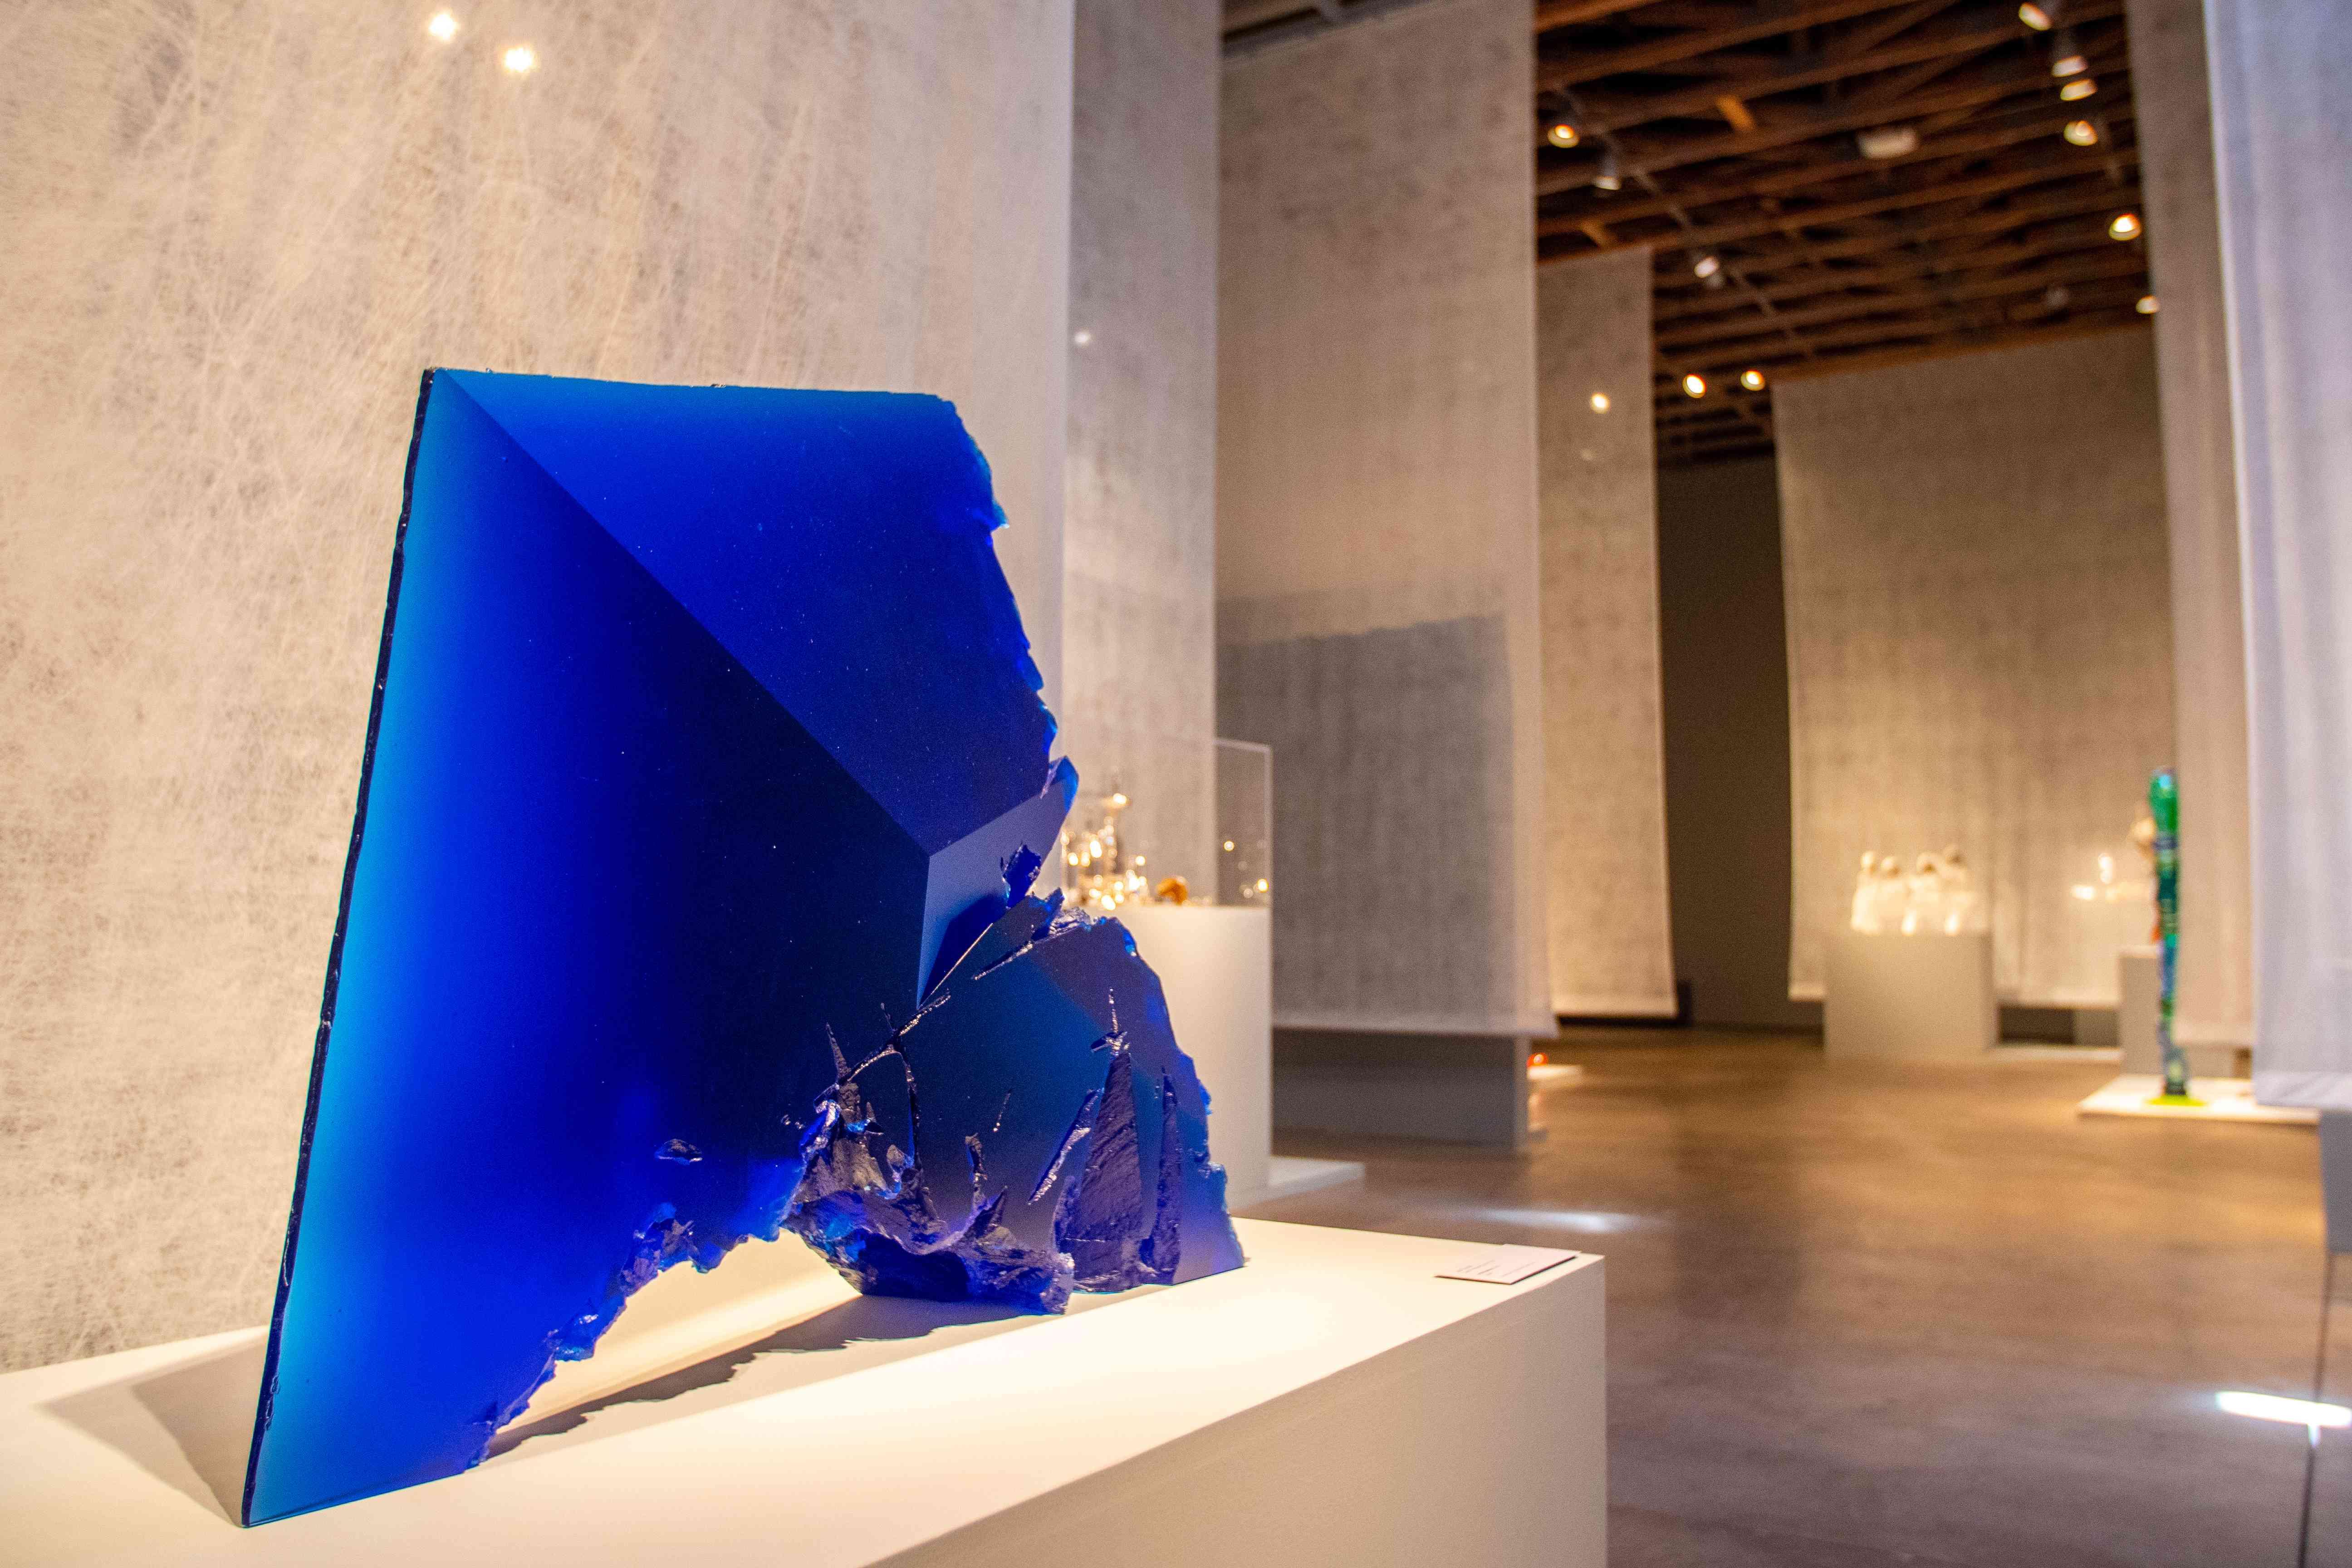 Museo de Arte Contemporáneo de Scottsdale